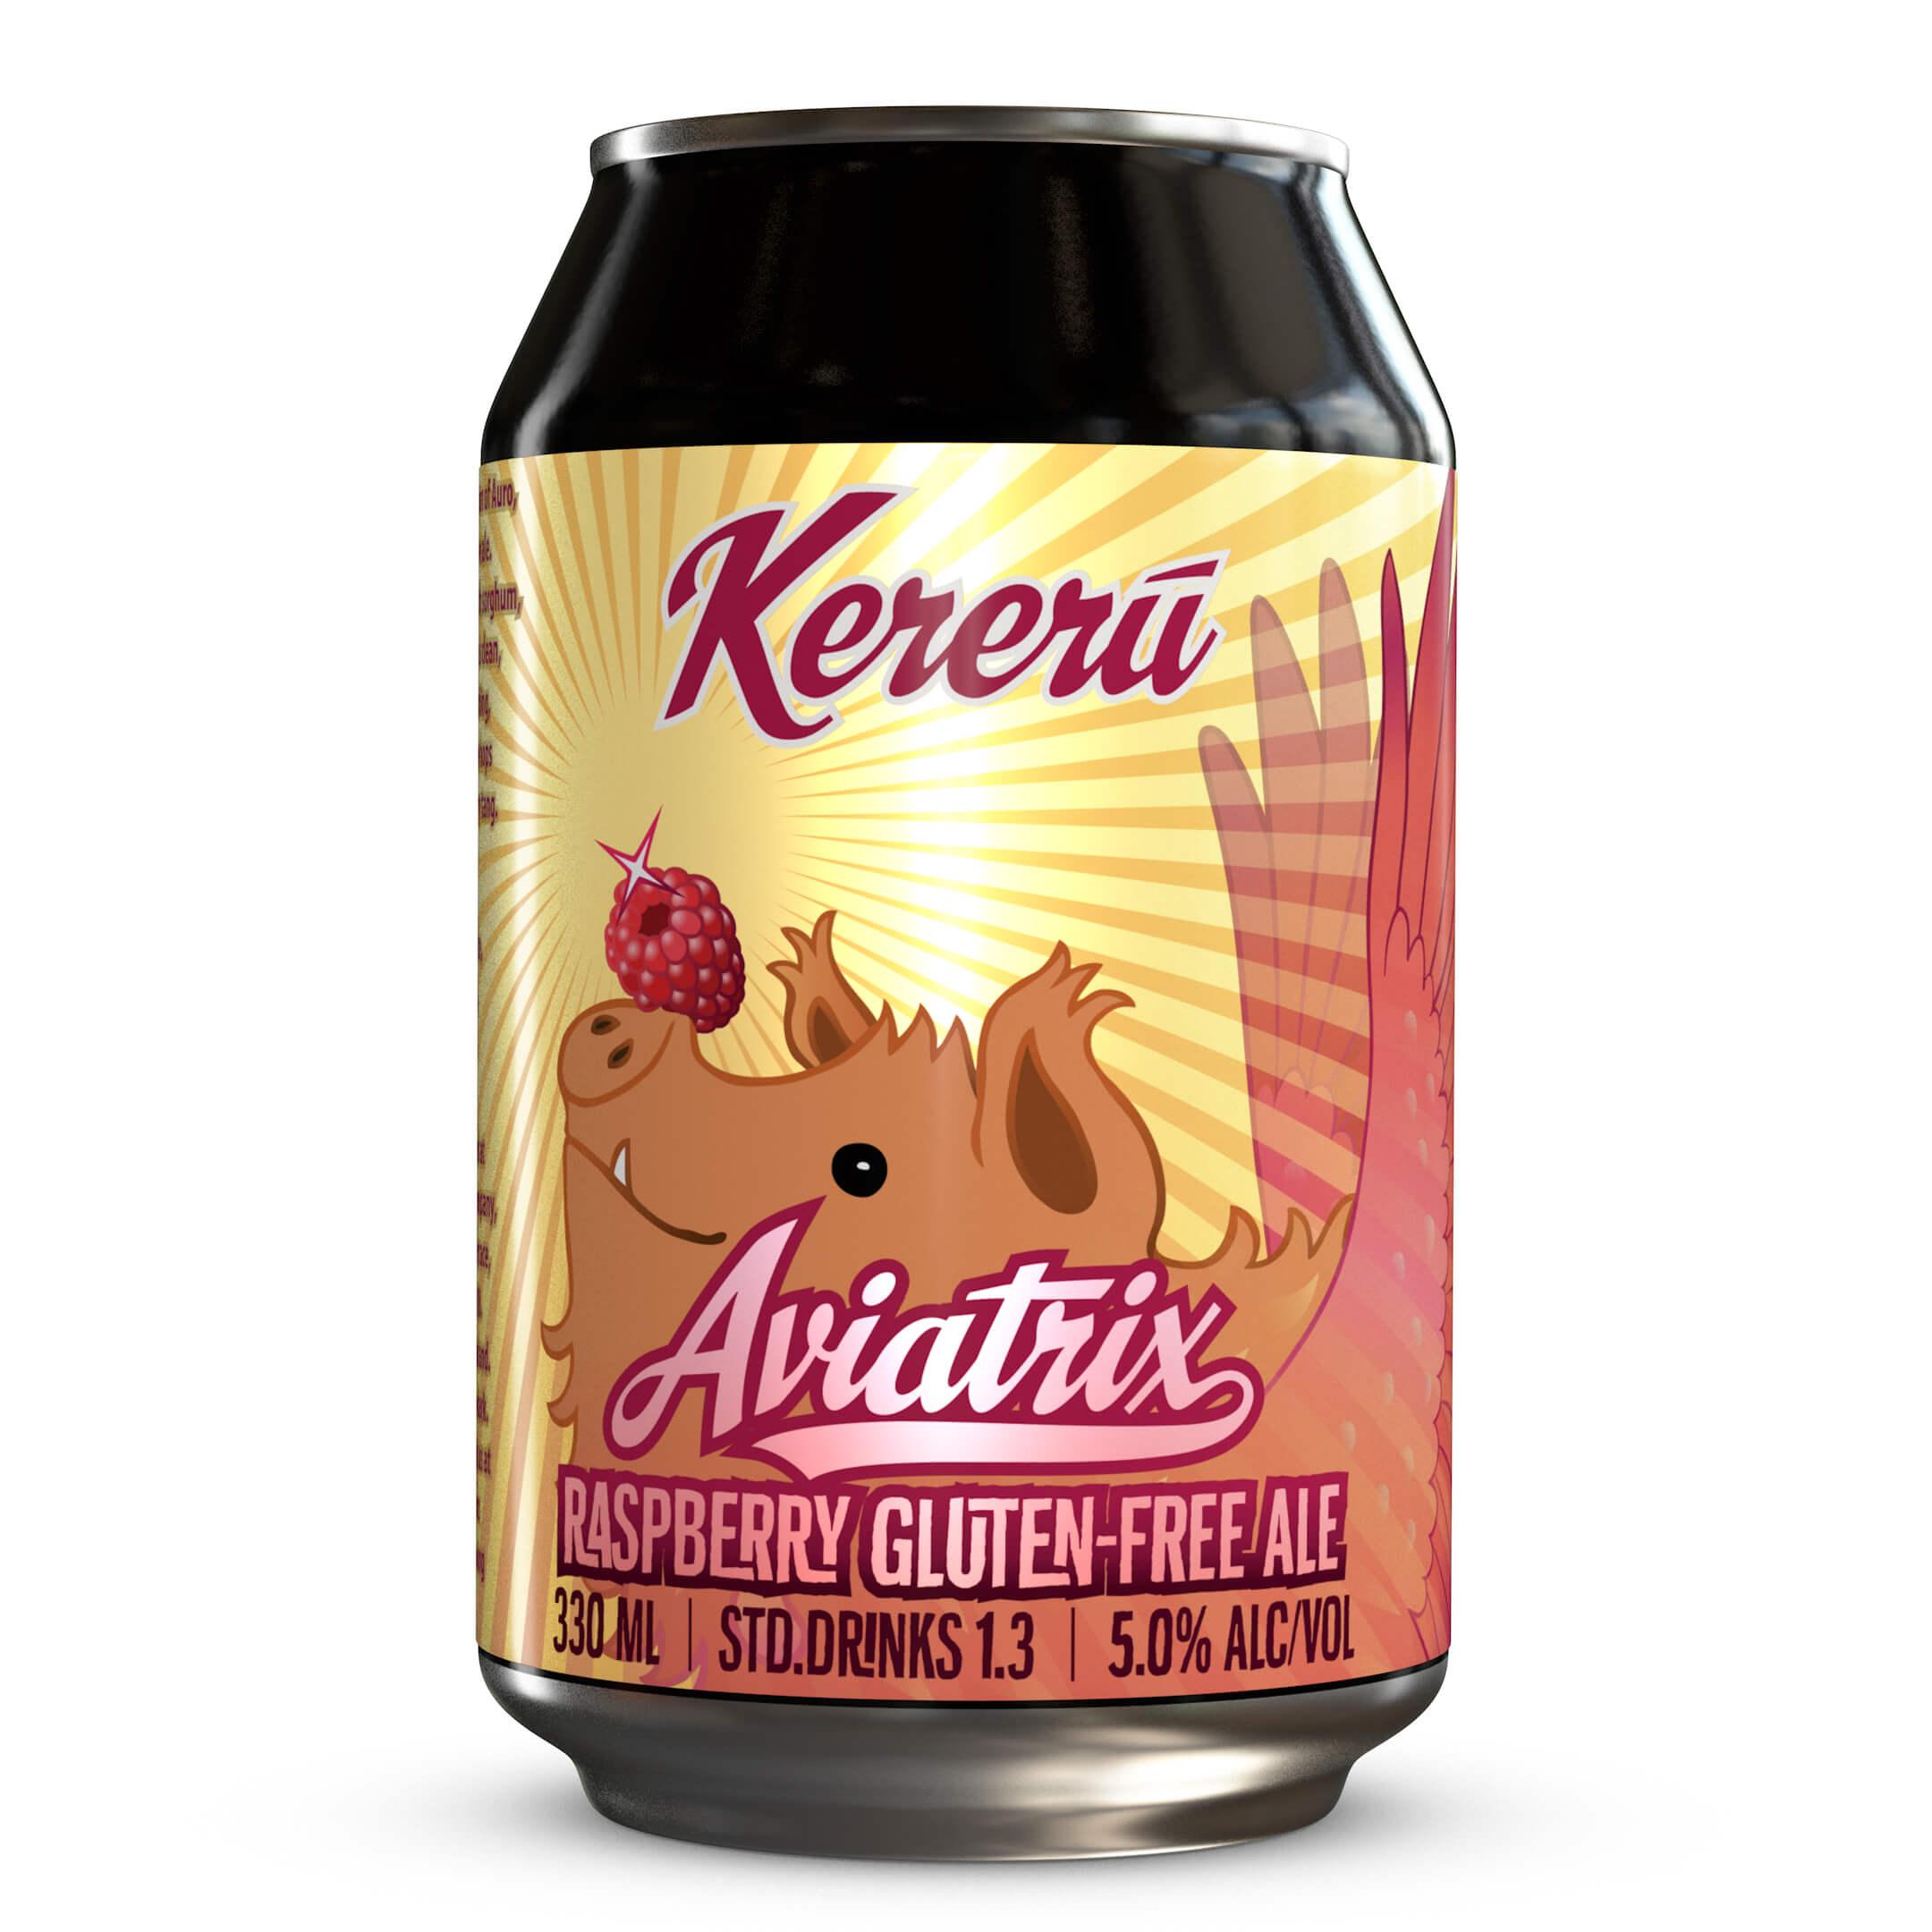 Aviatrix Raspberry Gluten-Free Ale | Gluten-Free Gold Beer ...